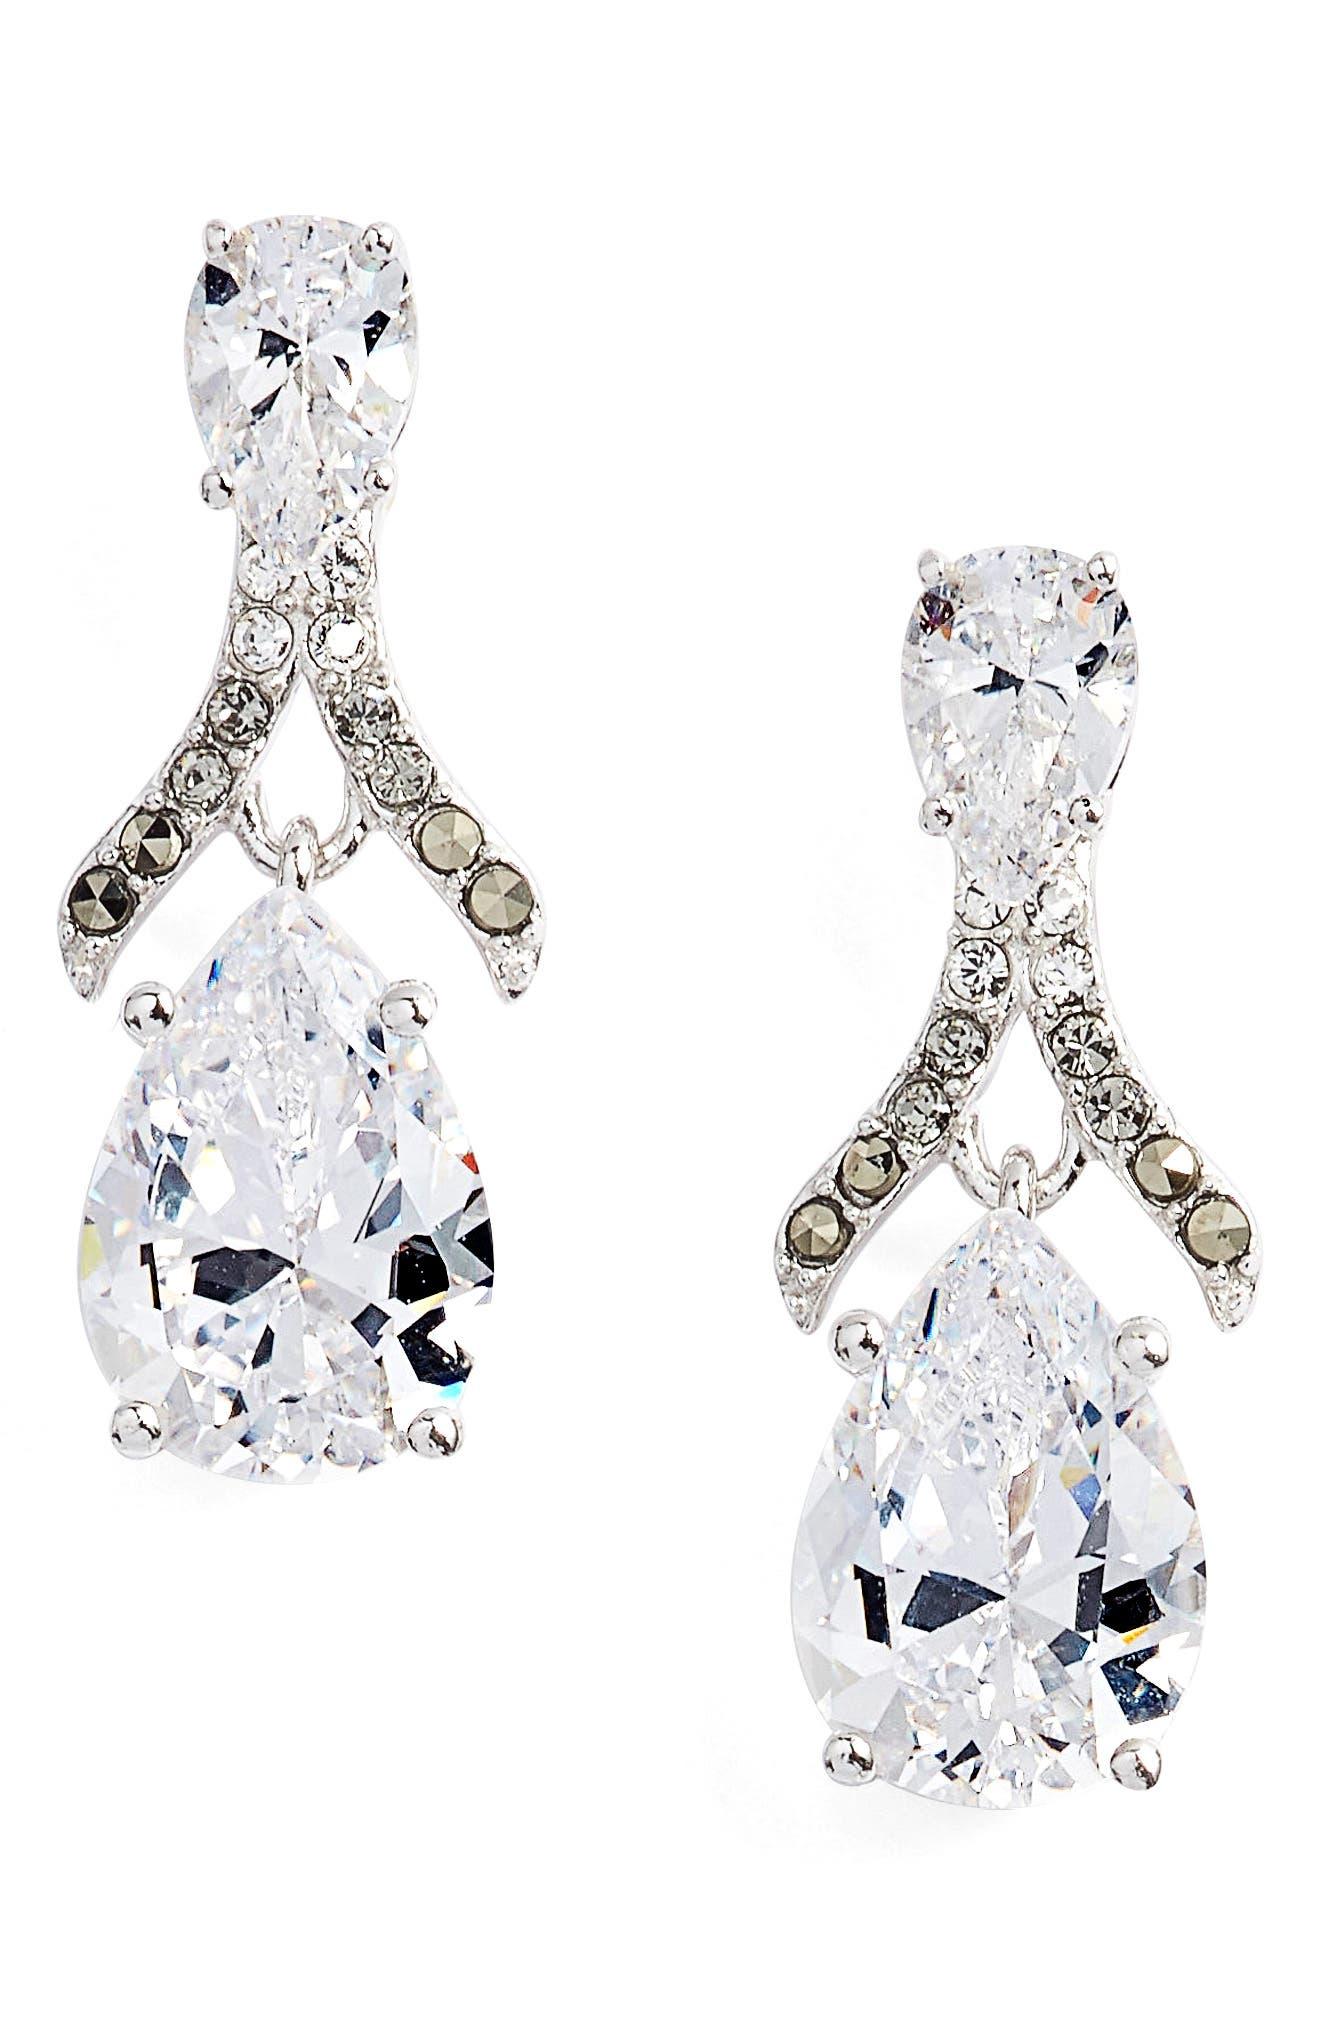 Cubic Zirconia Drop Earrings,                             Main thumbnail 1, color,